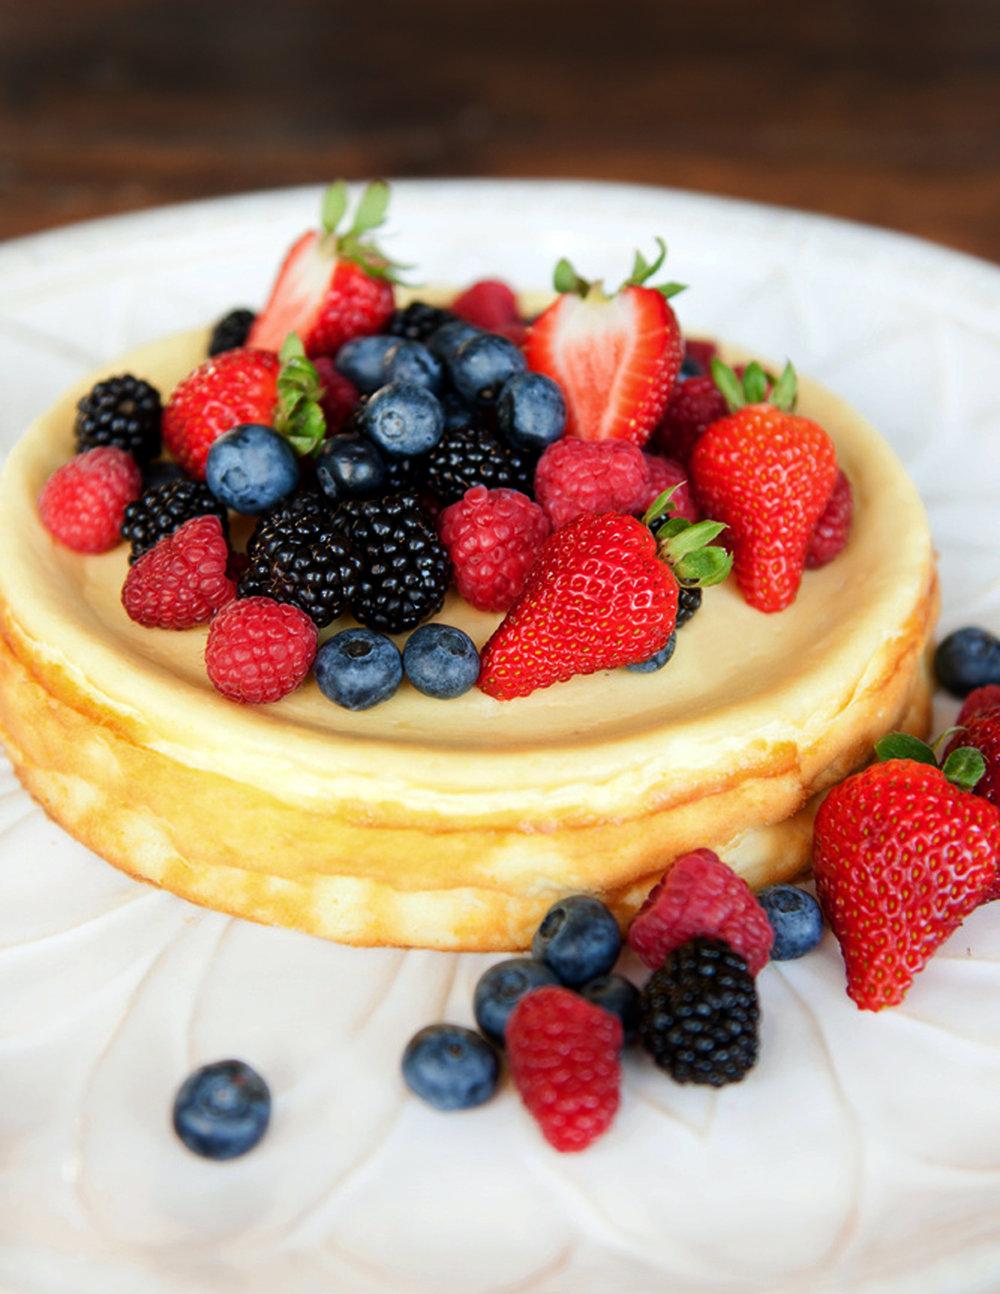 NG_124 - Lemon Cheesecake Vertical.jpg